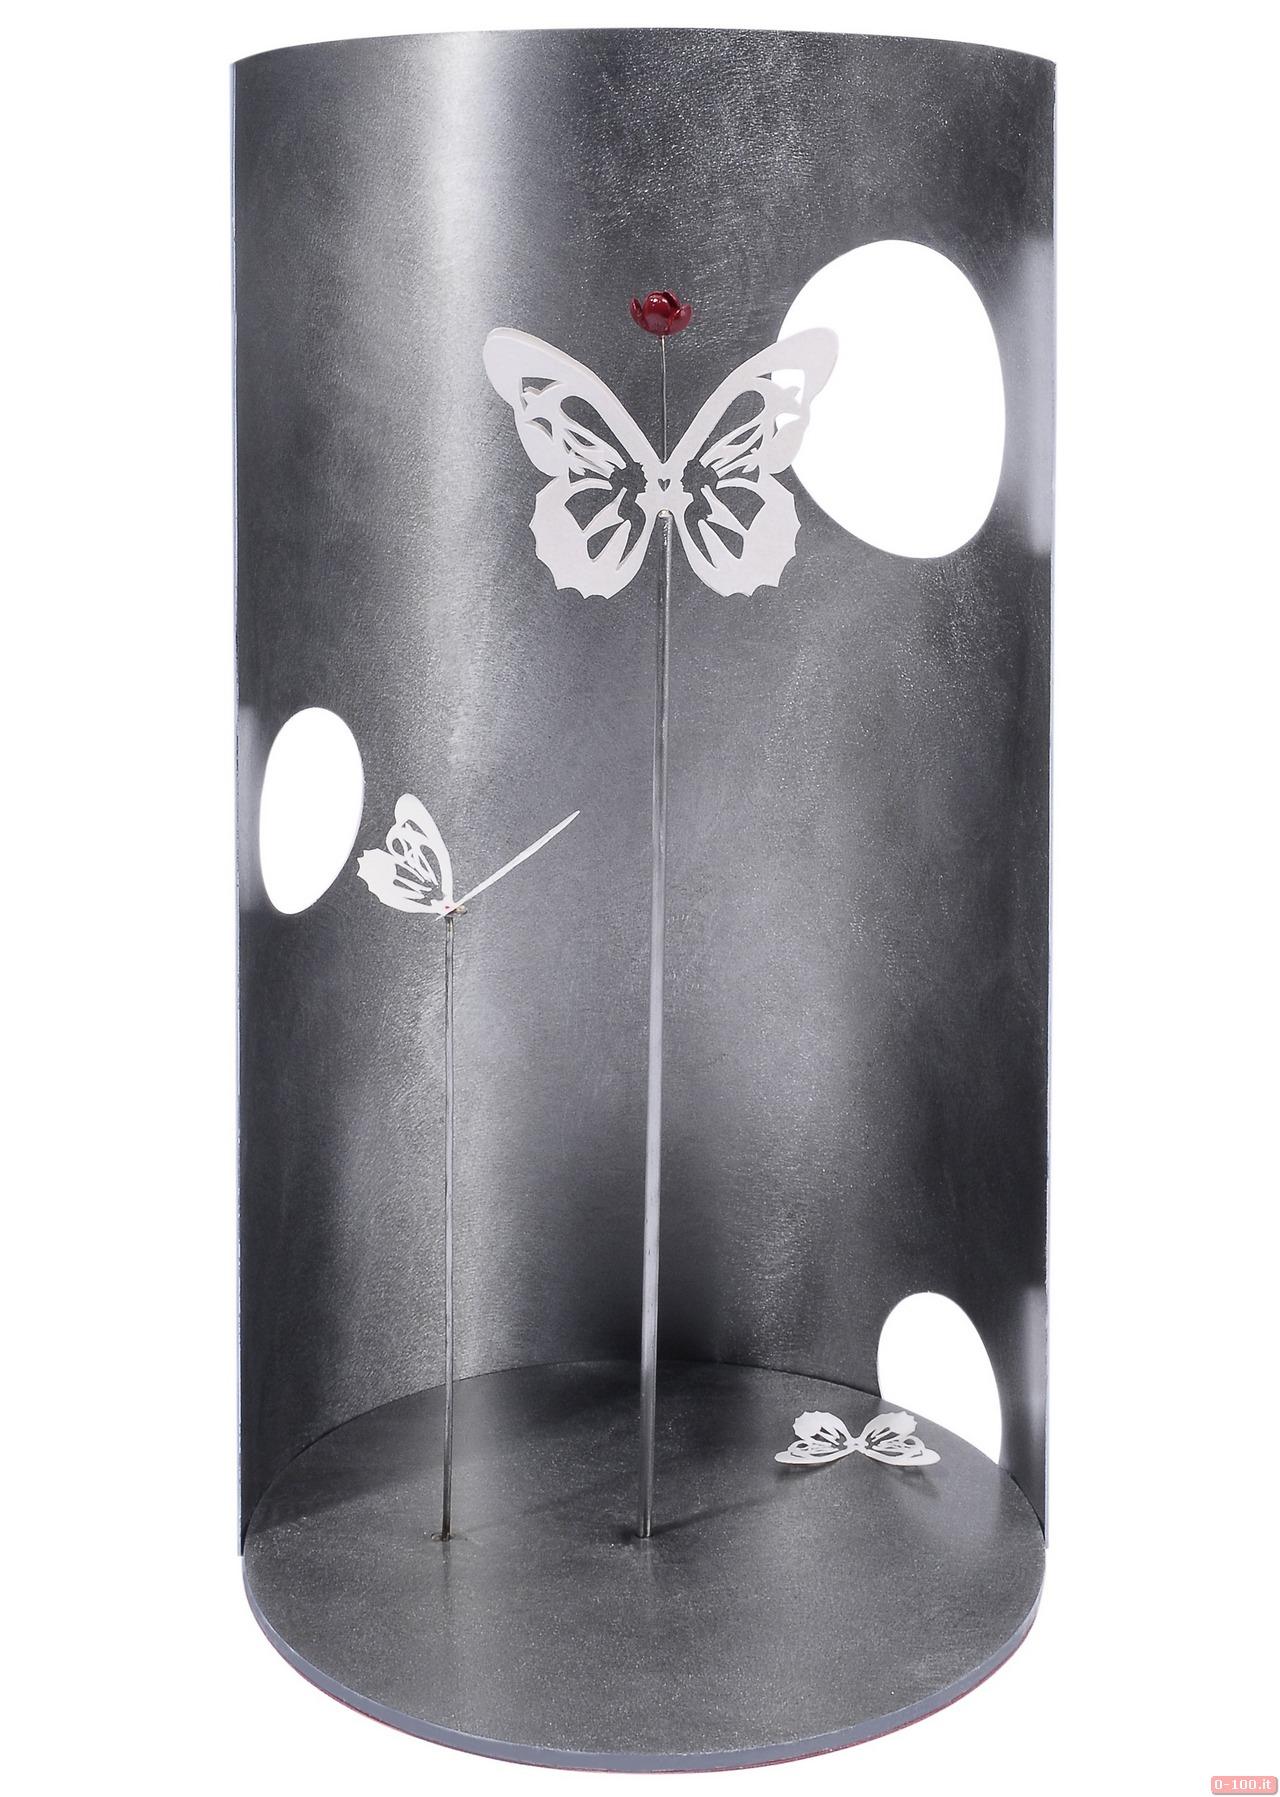 Blooming Creativity_The Gift of Wings - Filippo Disperati _Van Cleef & Arpels_0-100 2